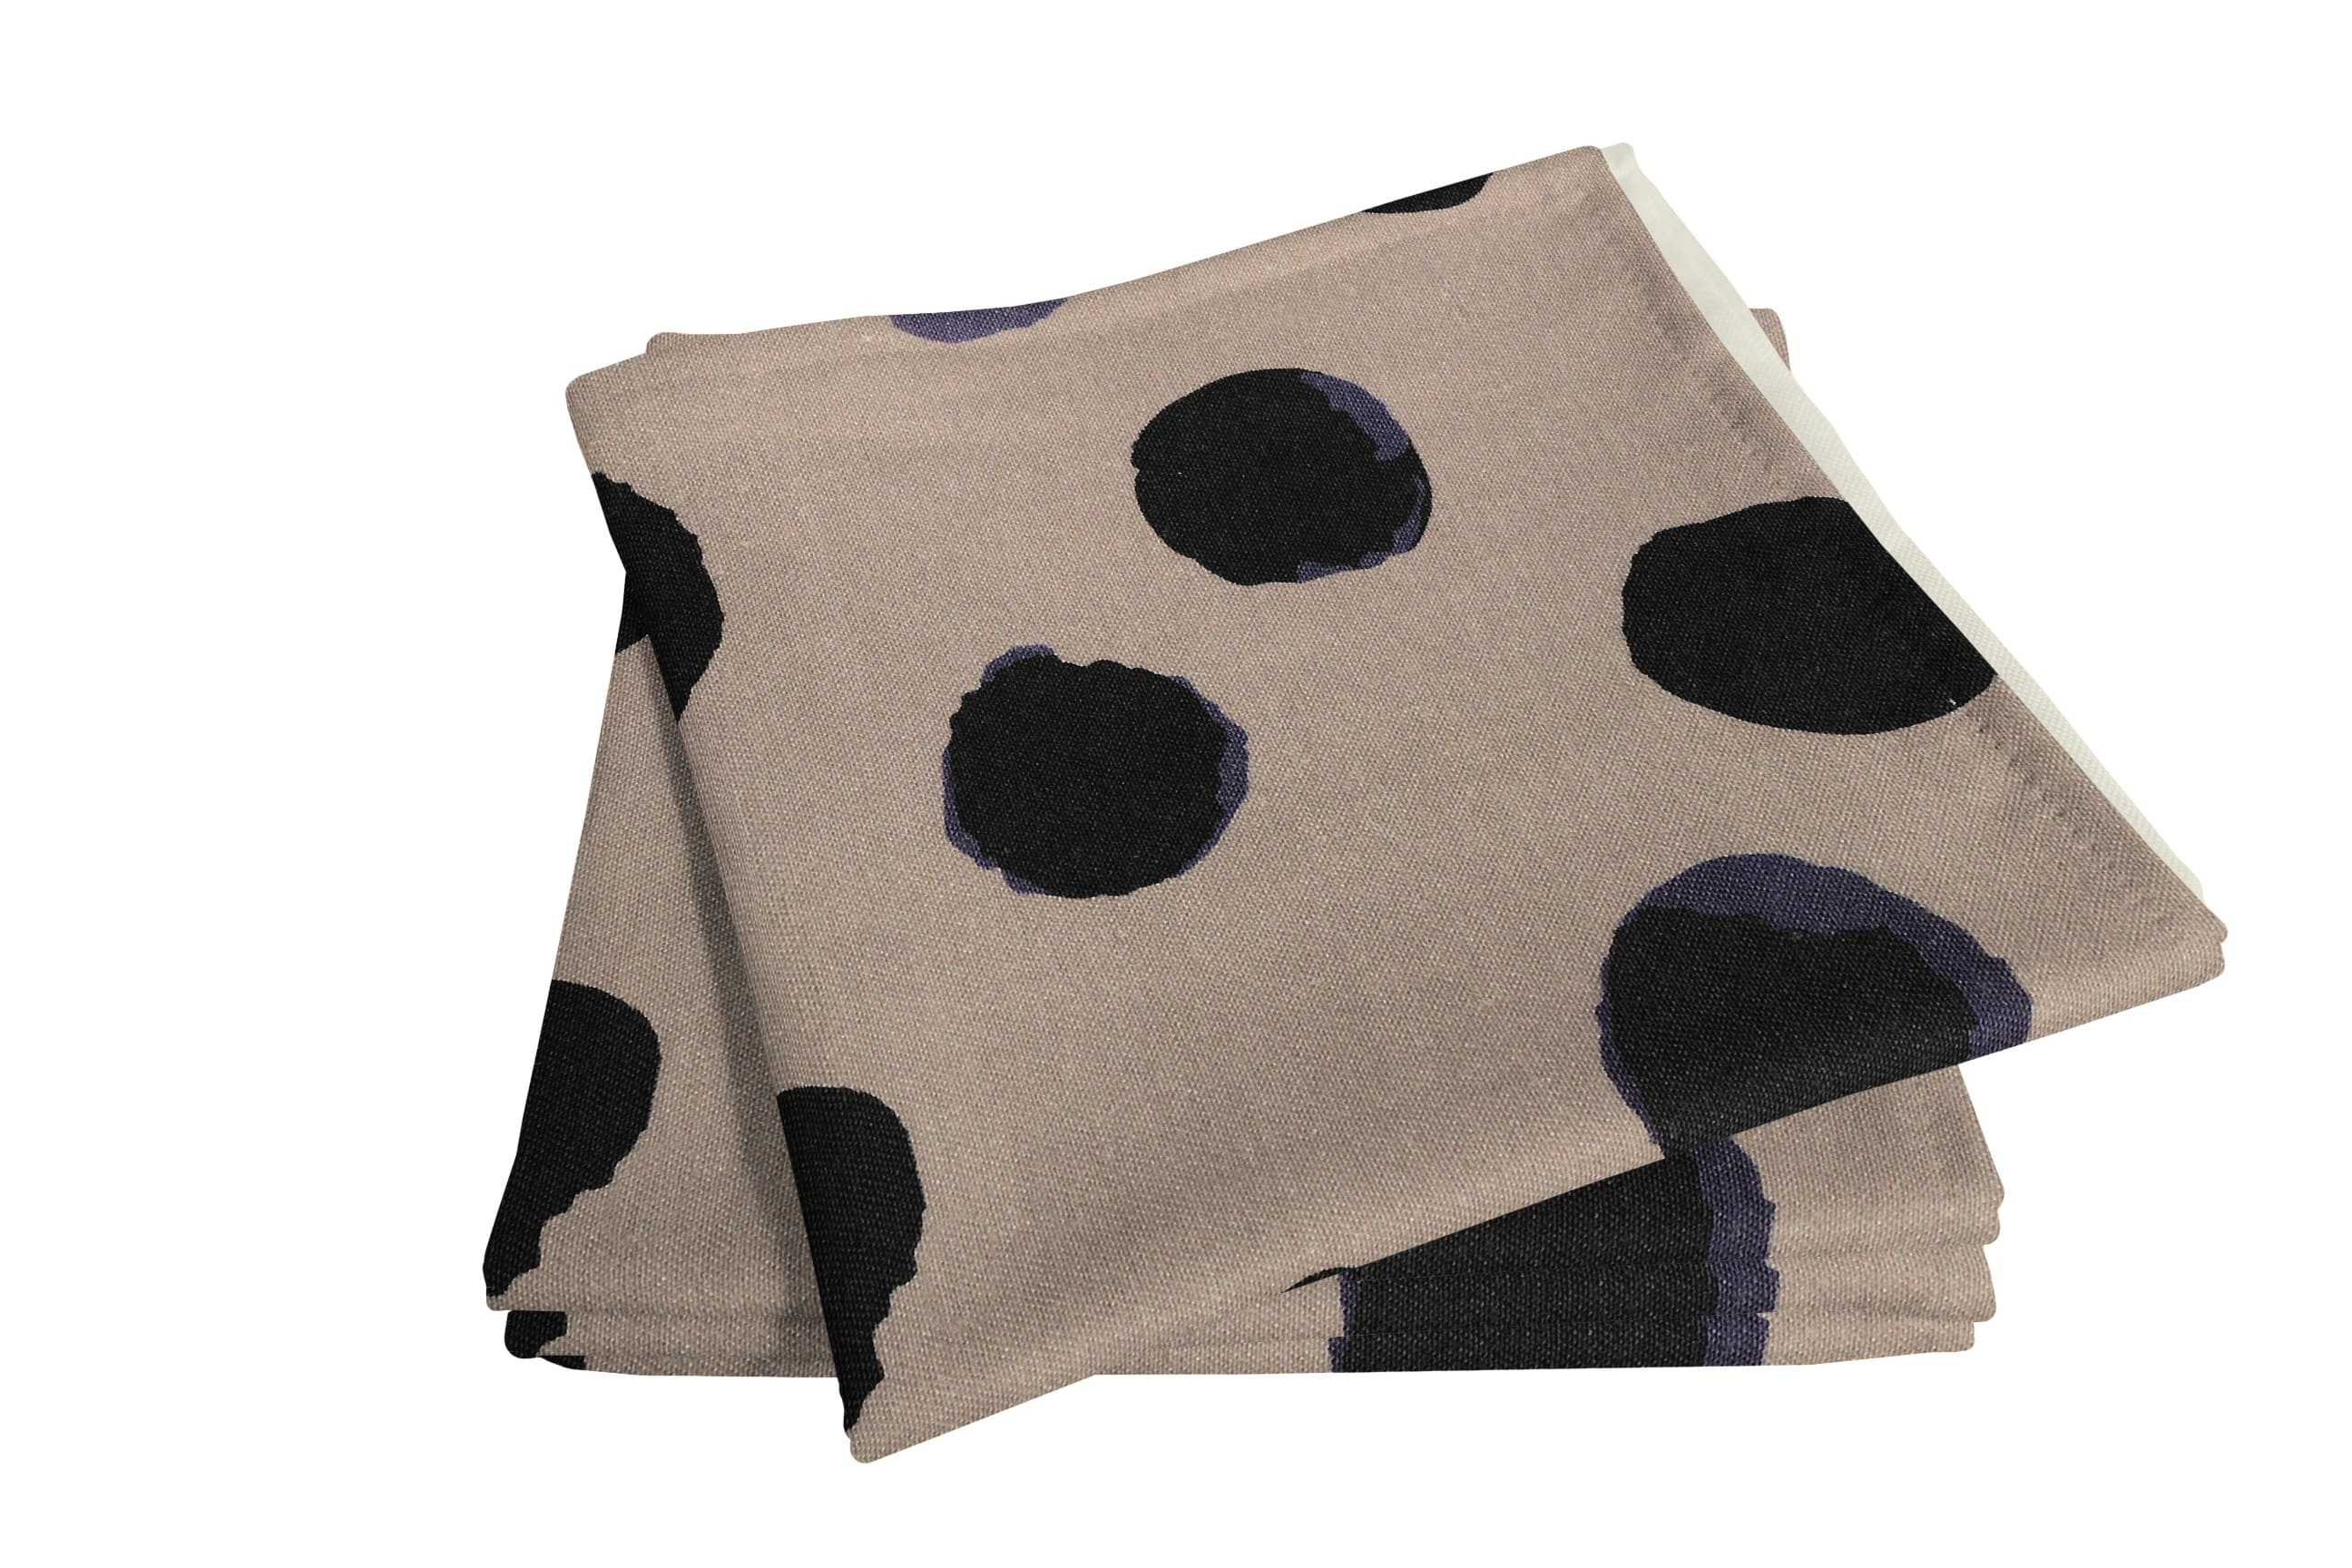 Leinenserviette 'Dots' (4er Pack)